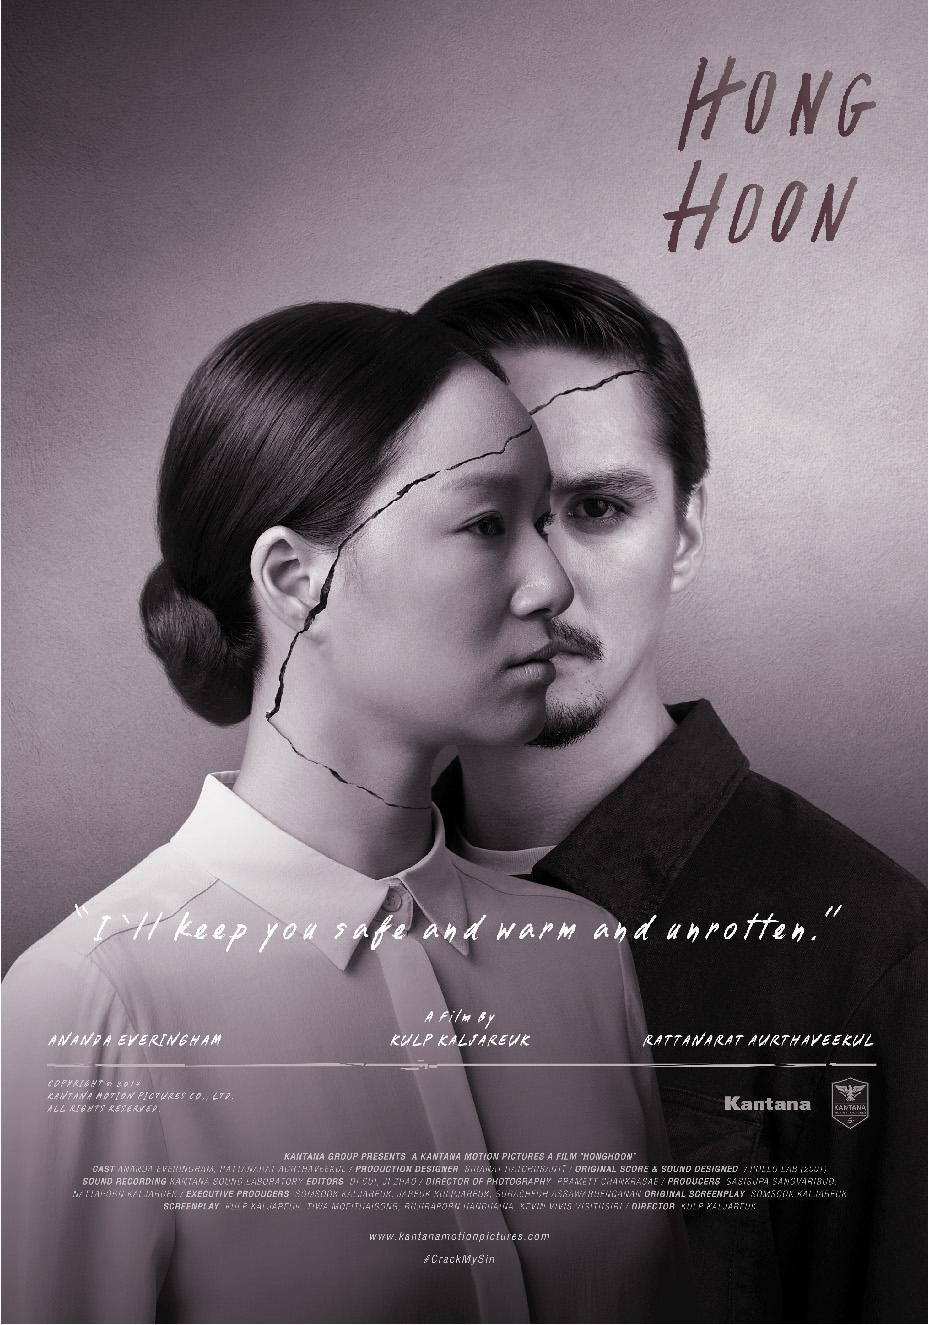 Integrated Media - HongHoon - 1